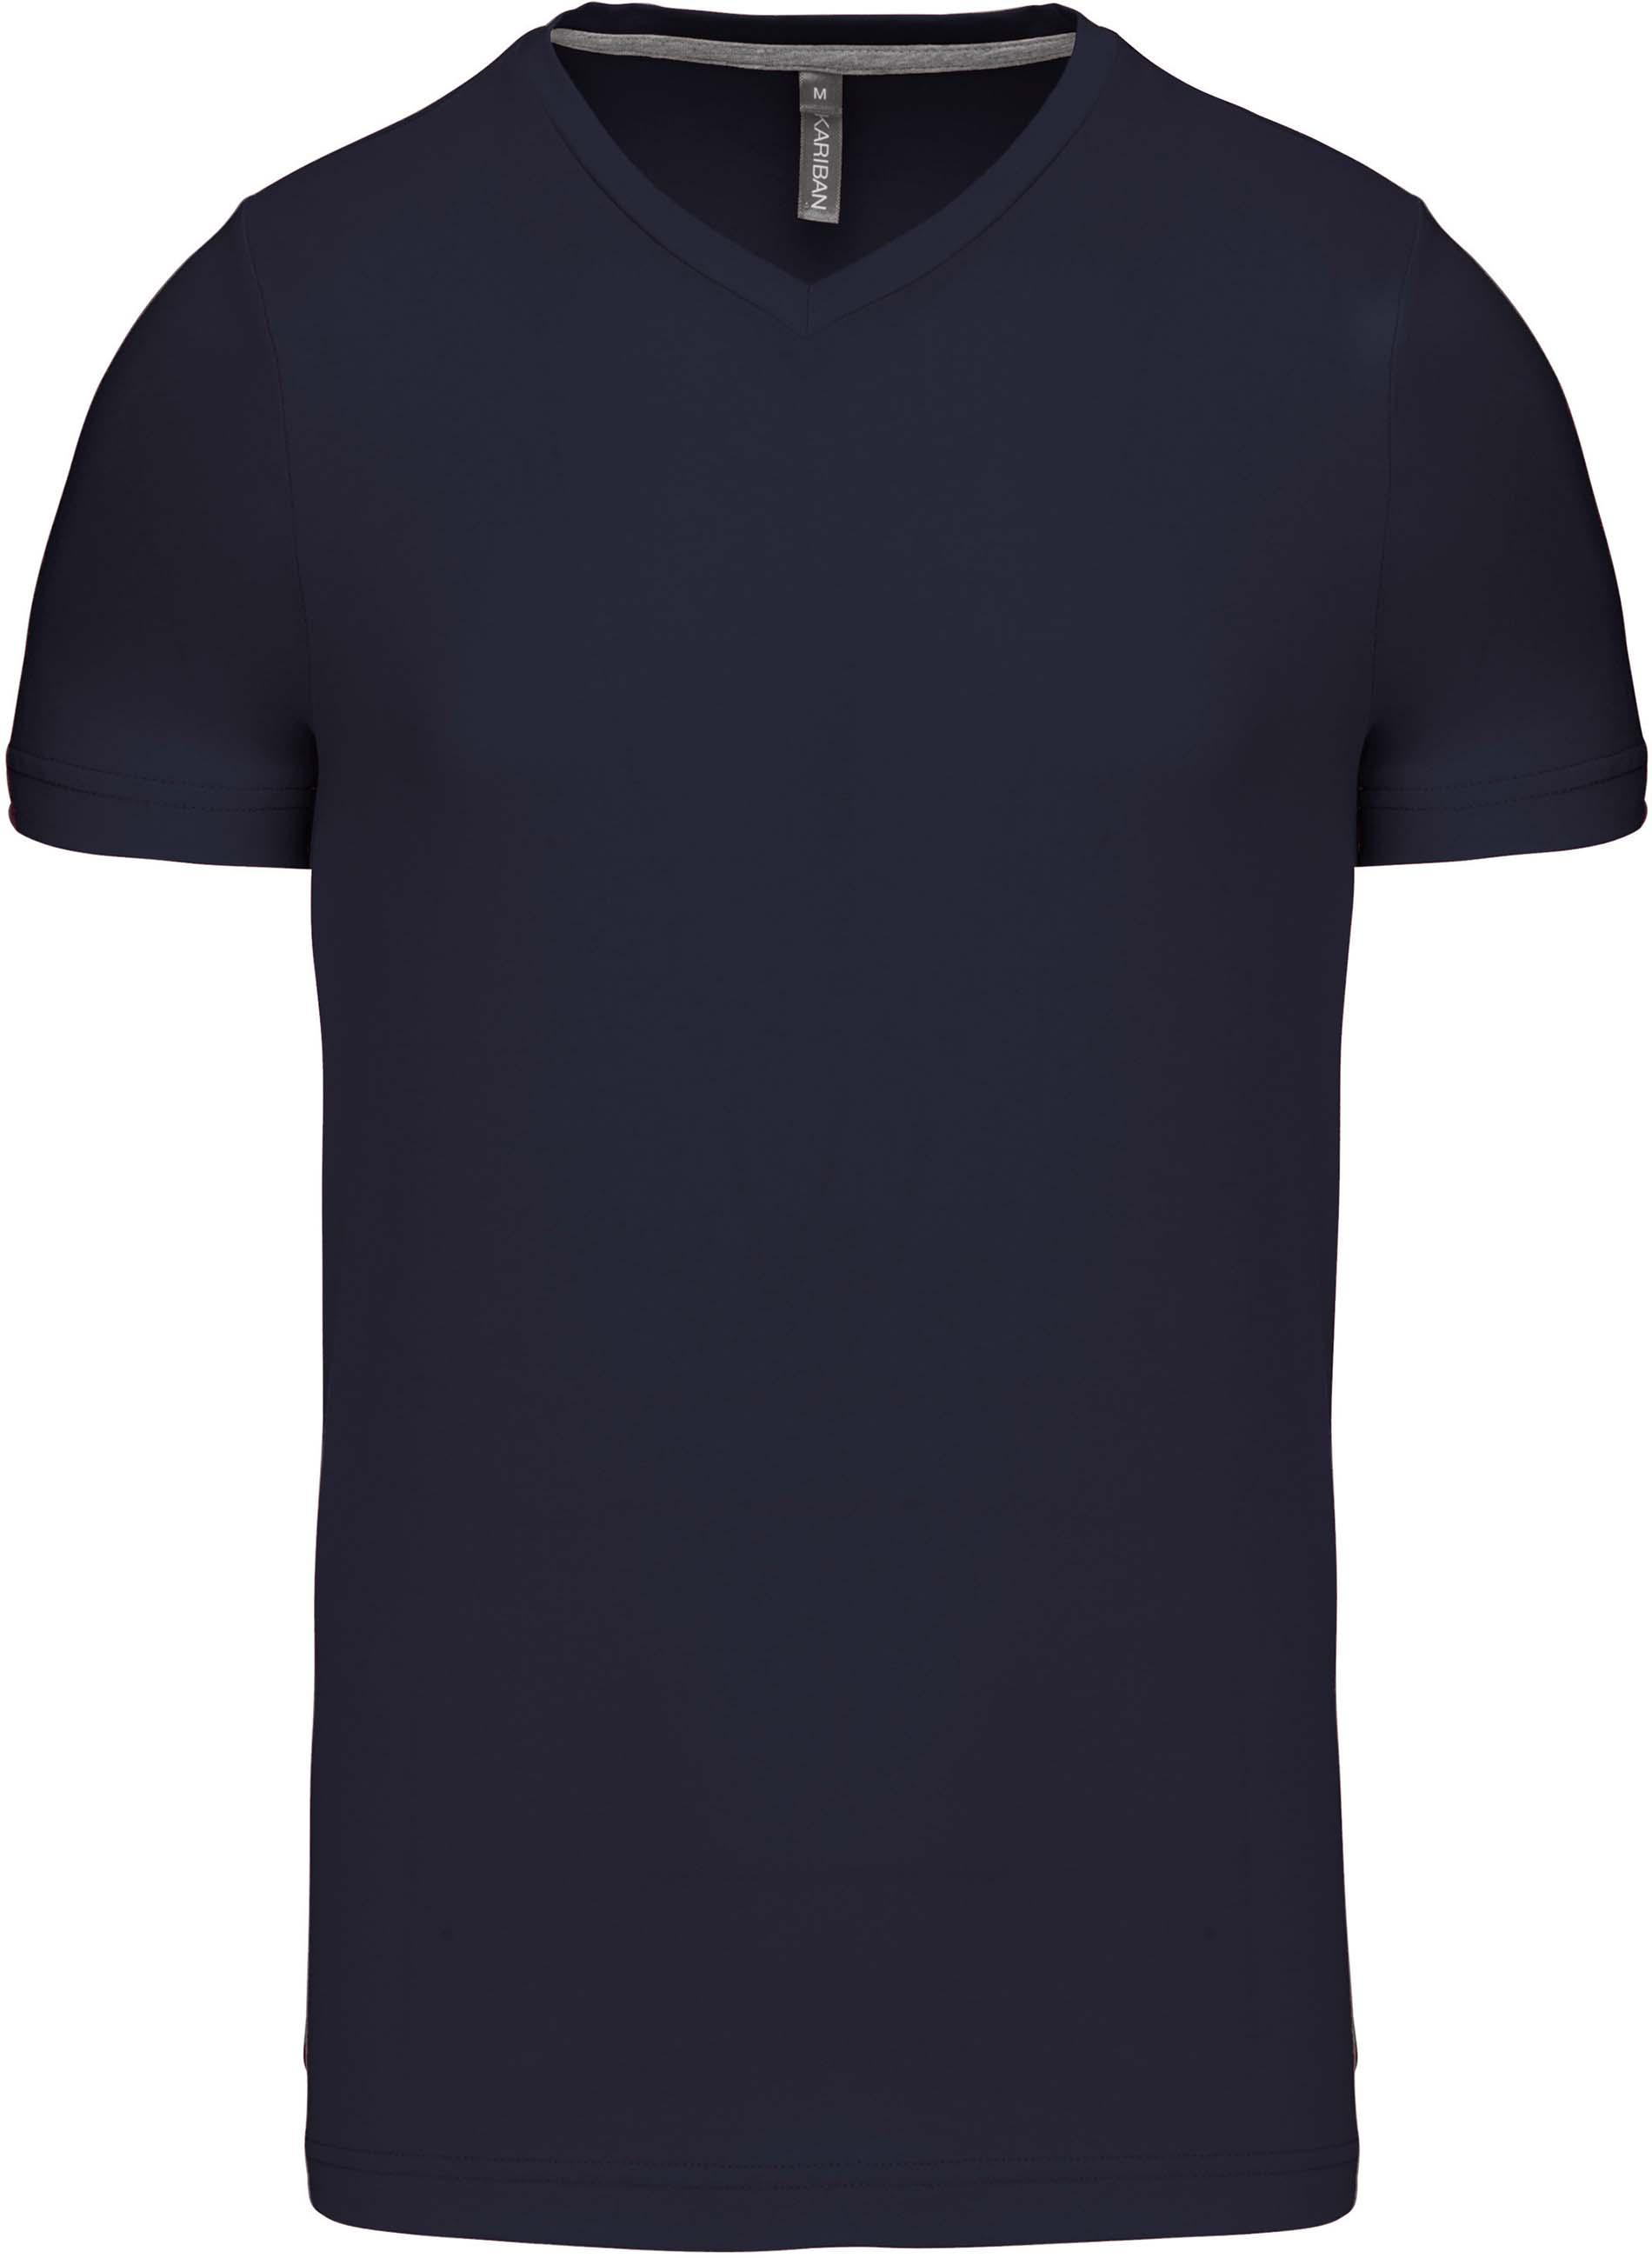 Pánské tričko kr.rukáv V-neck. Barva: Navy